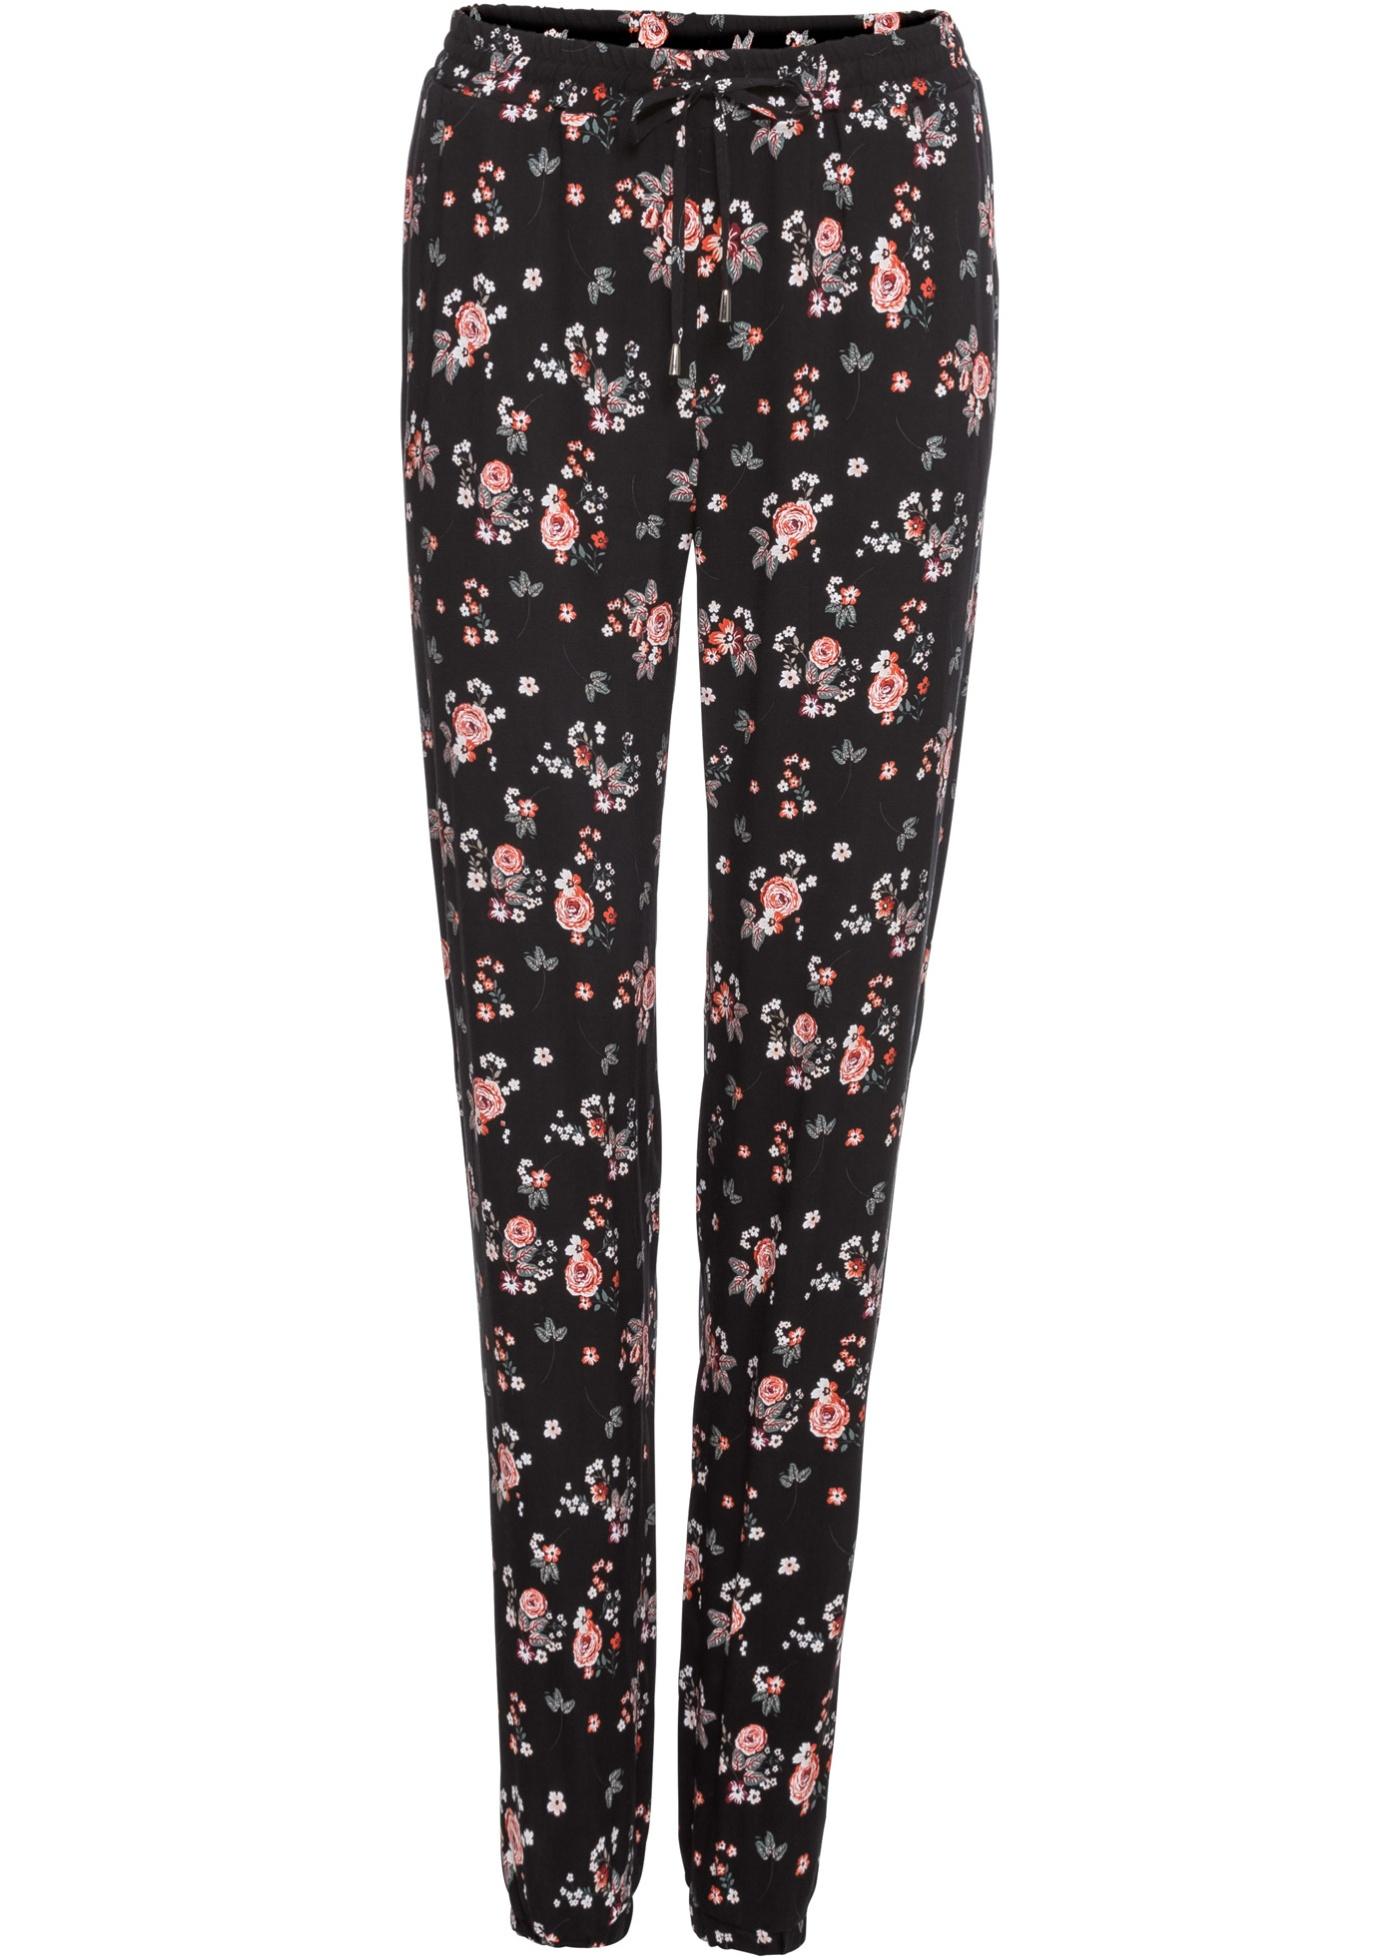 Hosen - Hose mit Blumendruck › bonprix › schwarz  - Onlineshop Bonprix